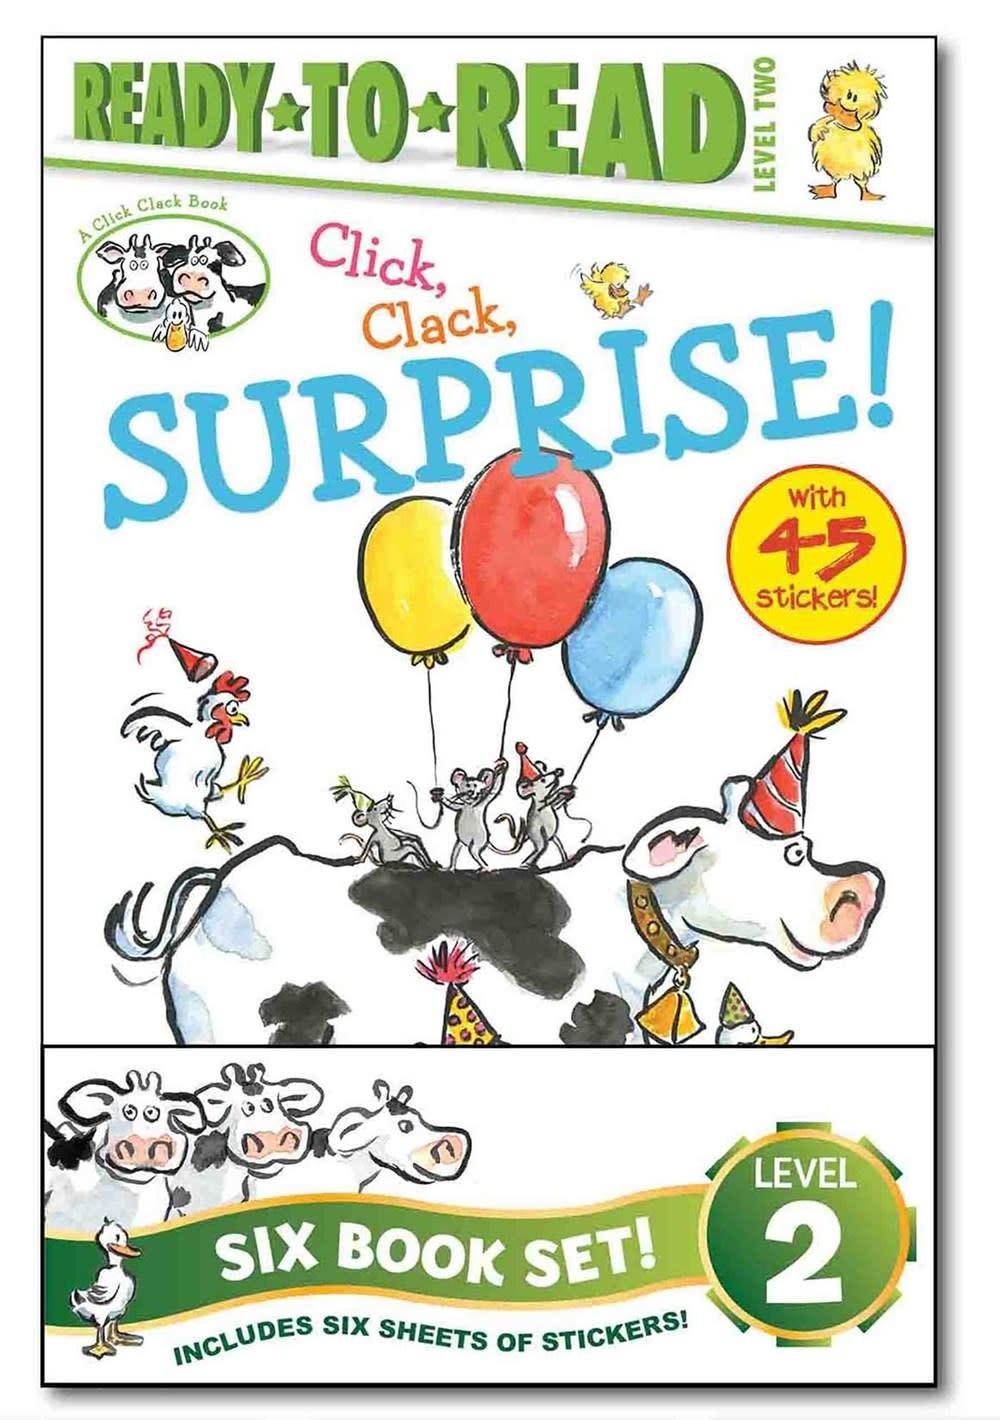 Simon Spotlight Click, Clack! Value Pack Boxed Set (6 Books, Ready-to-Read, Lvl 2)